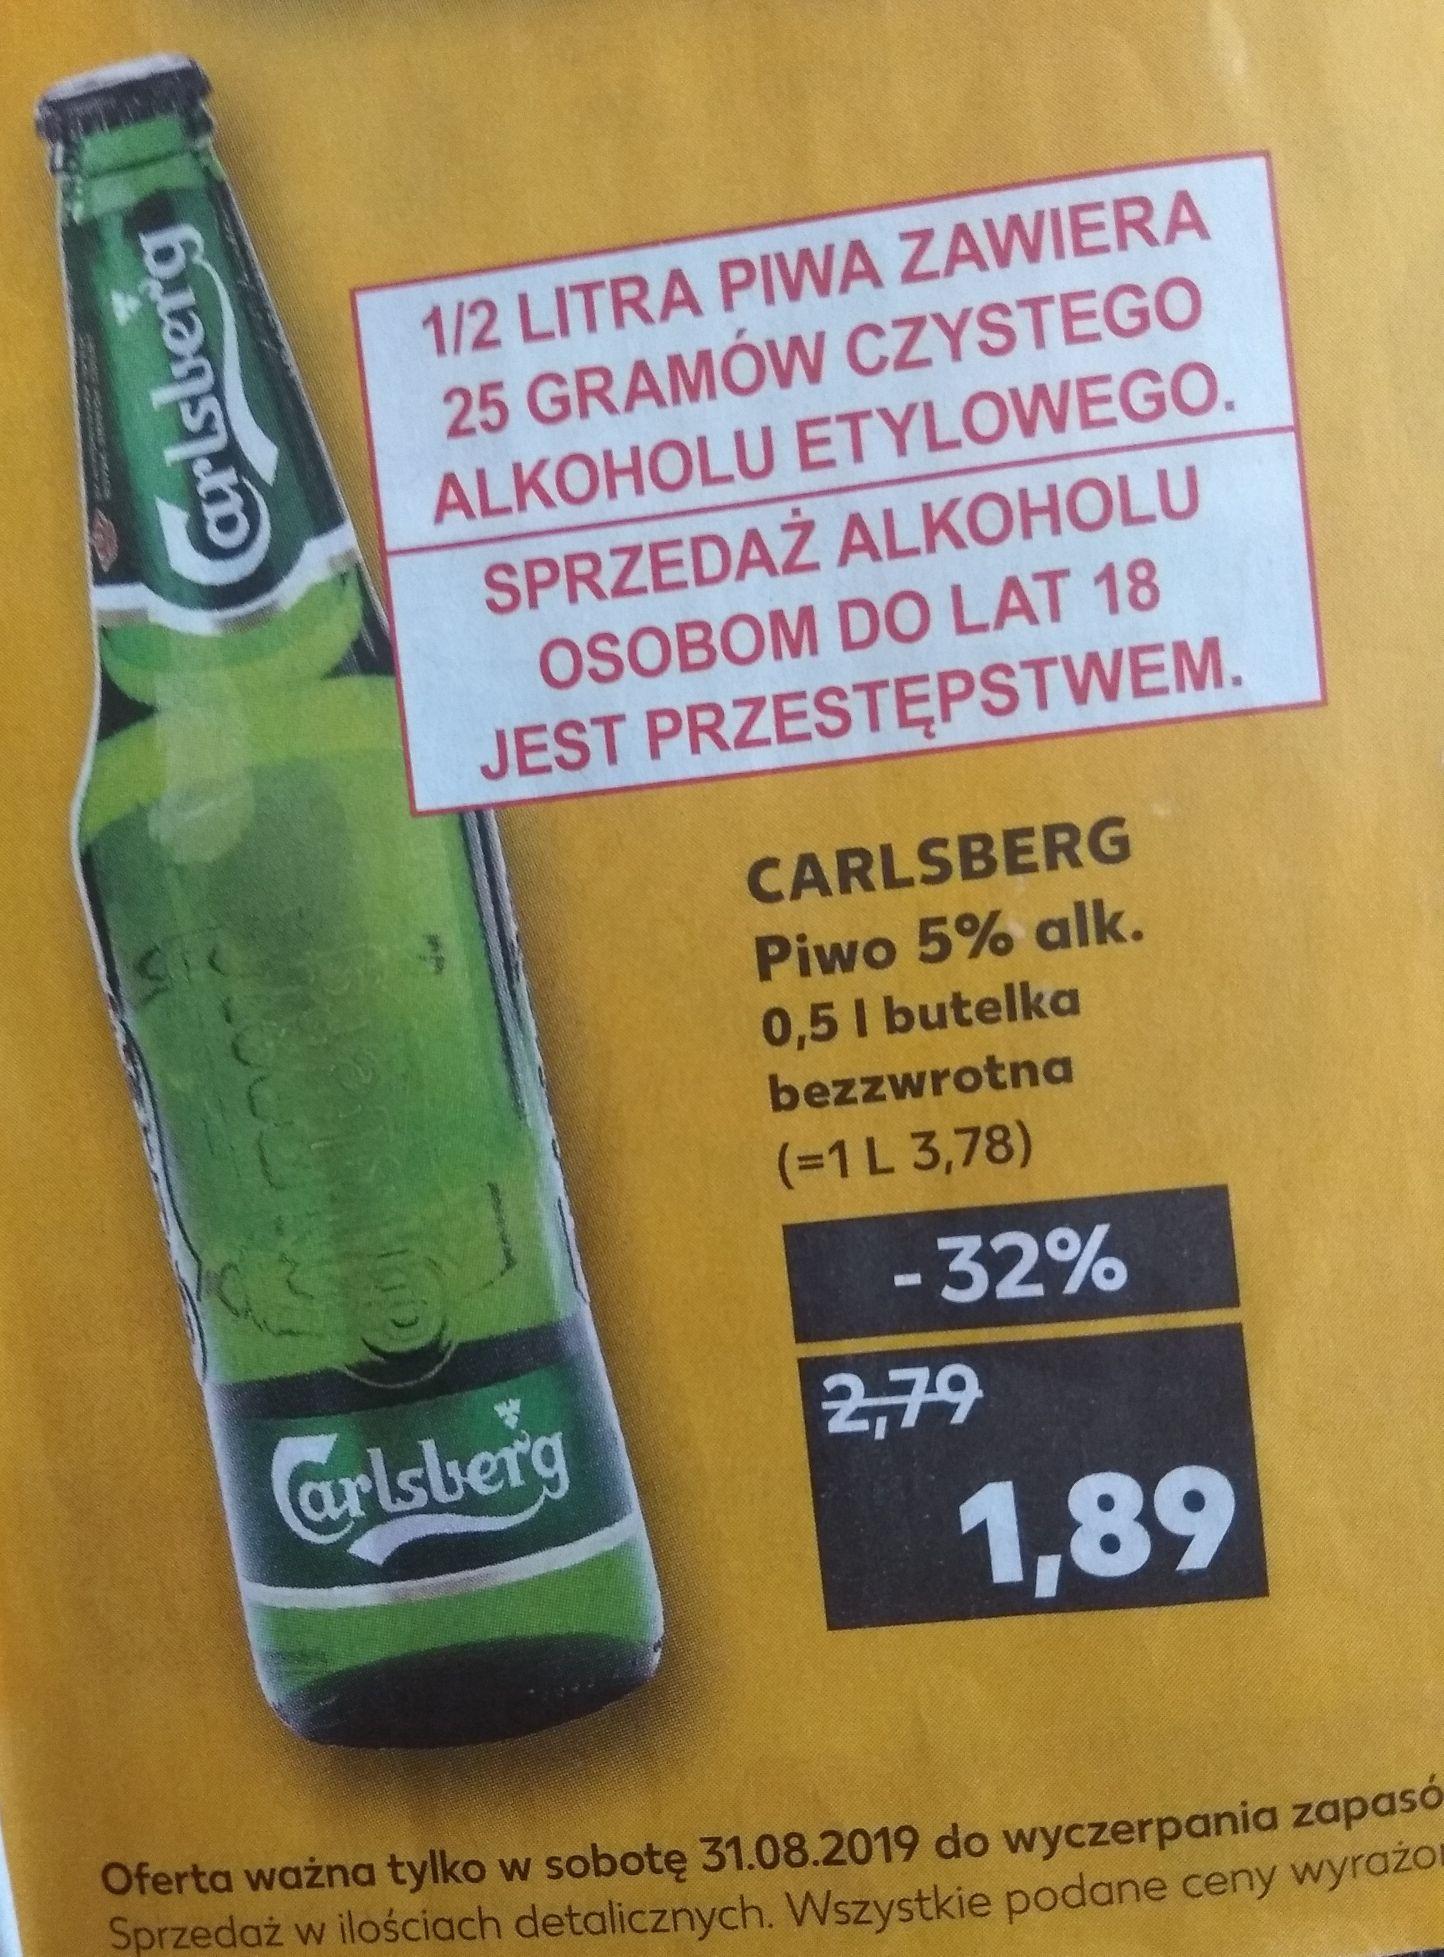 Piwo Carlsberg - Kaufland Łódź